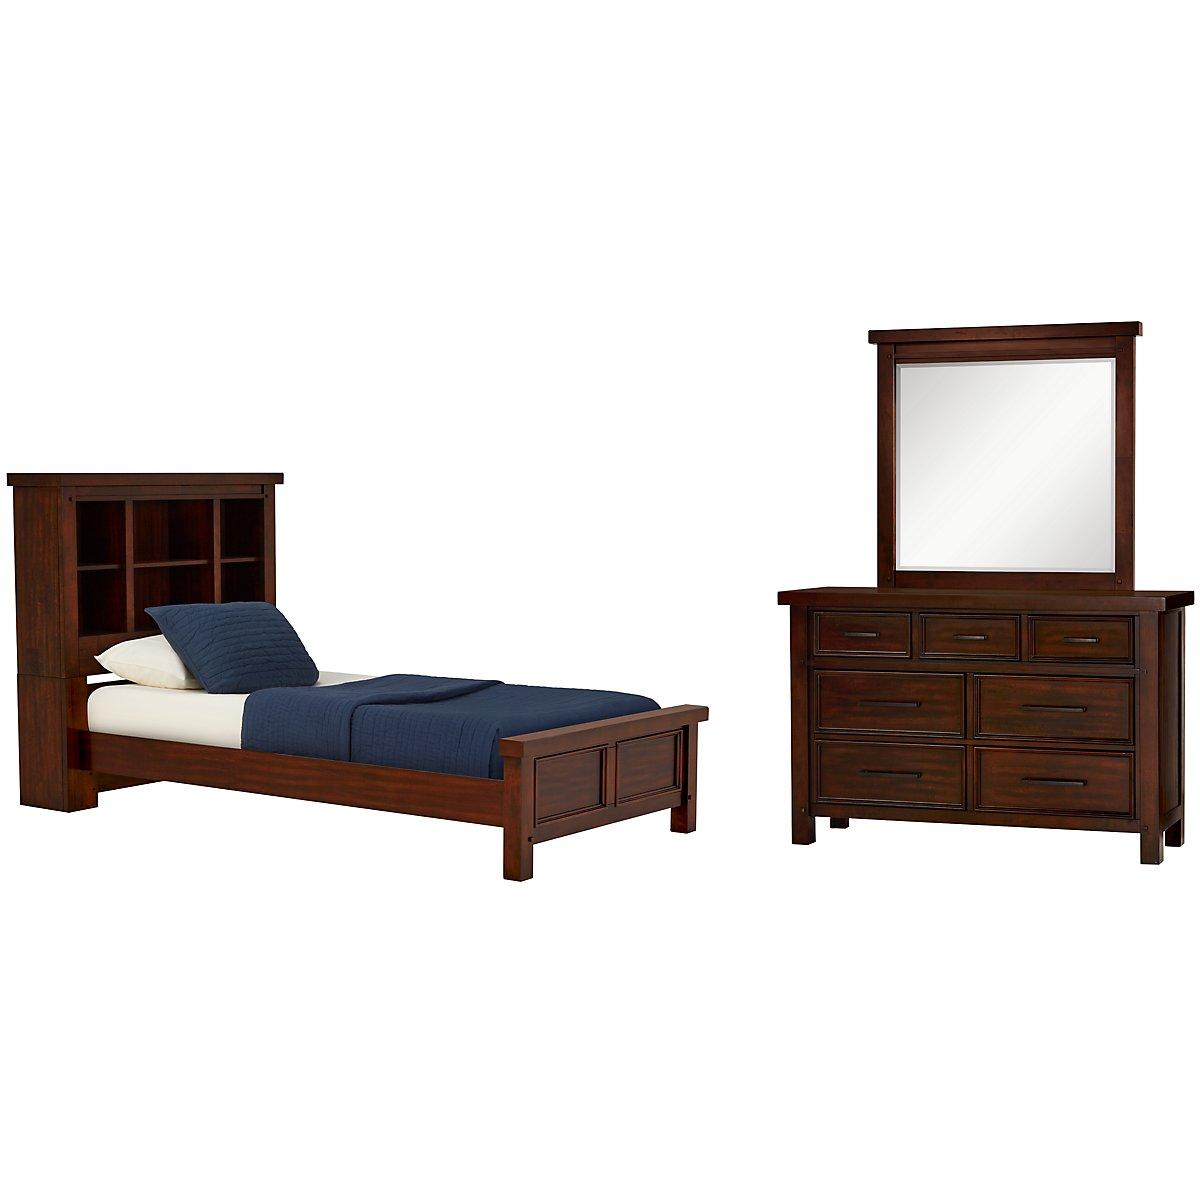 City furniture napa dark tone bookcase bedroom for Napa valley bedroom furniture